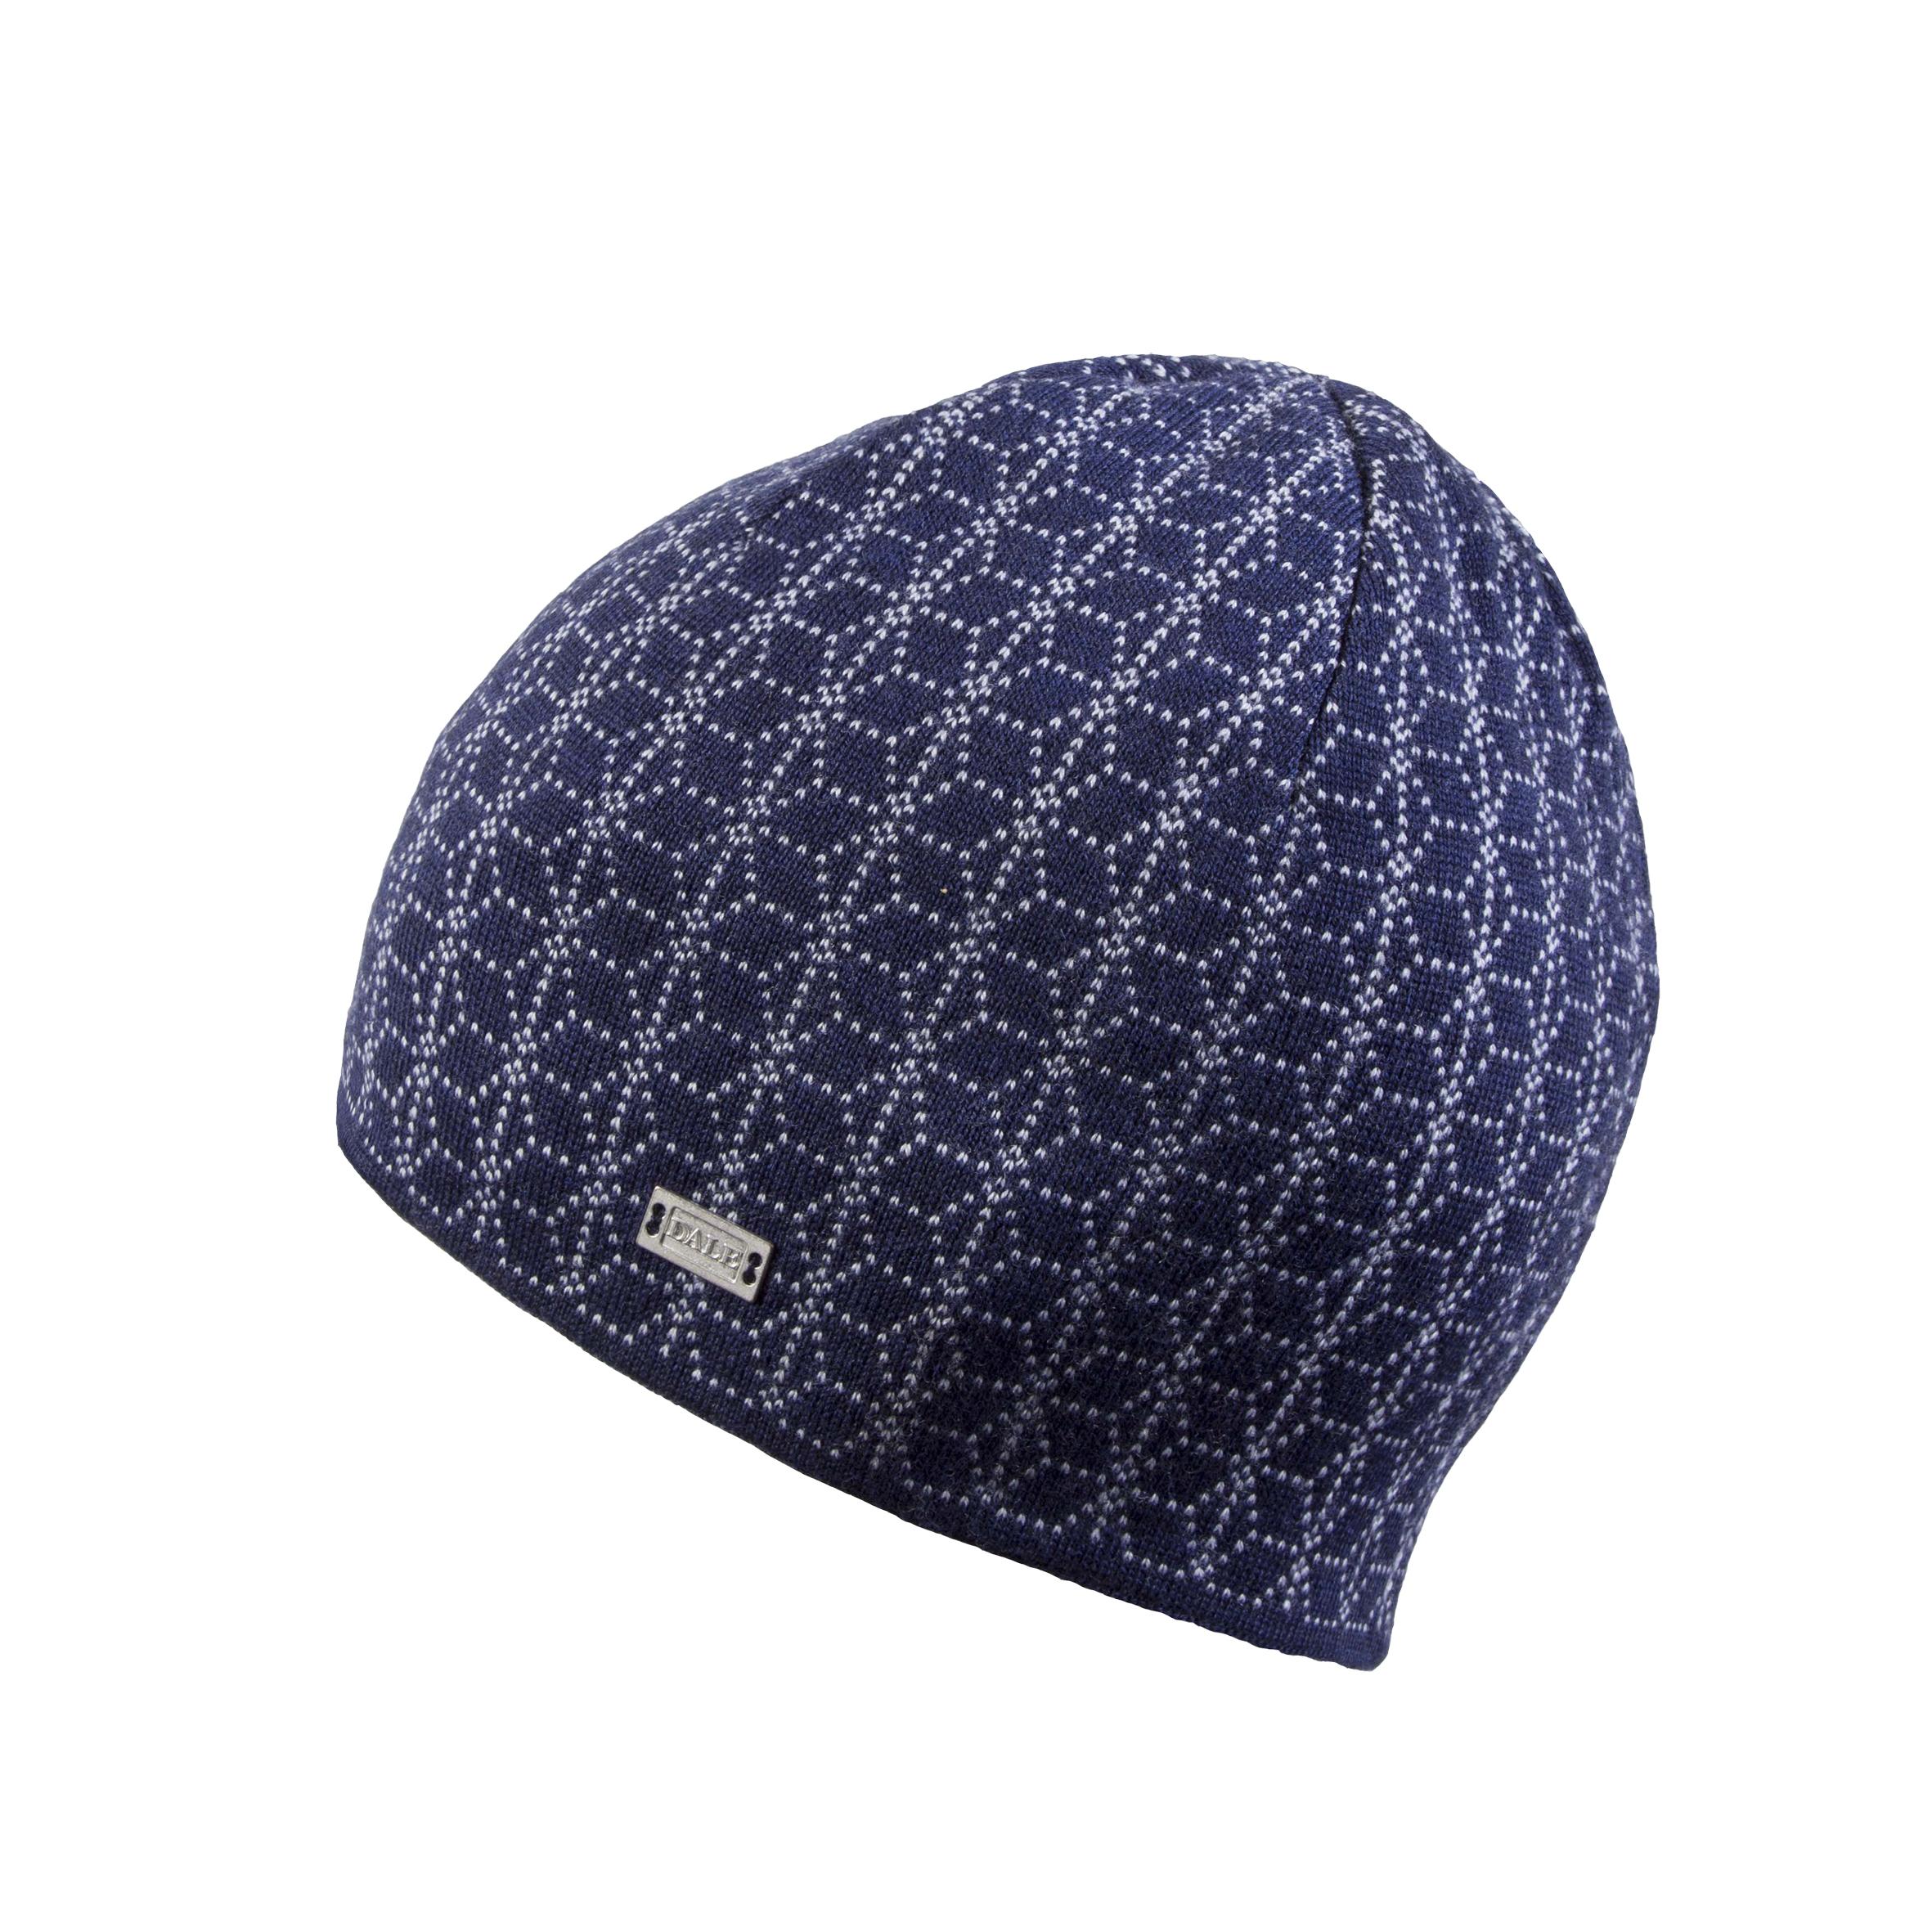 Navy / Ice Blue (C)